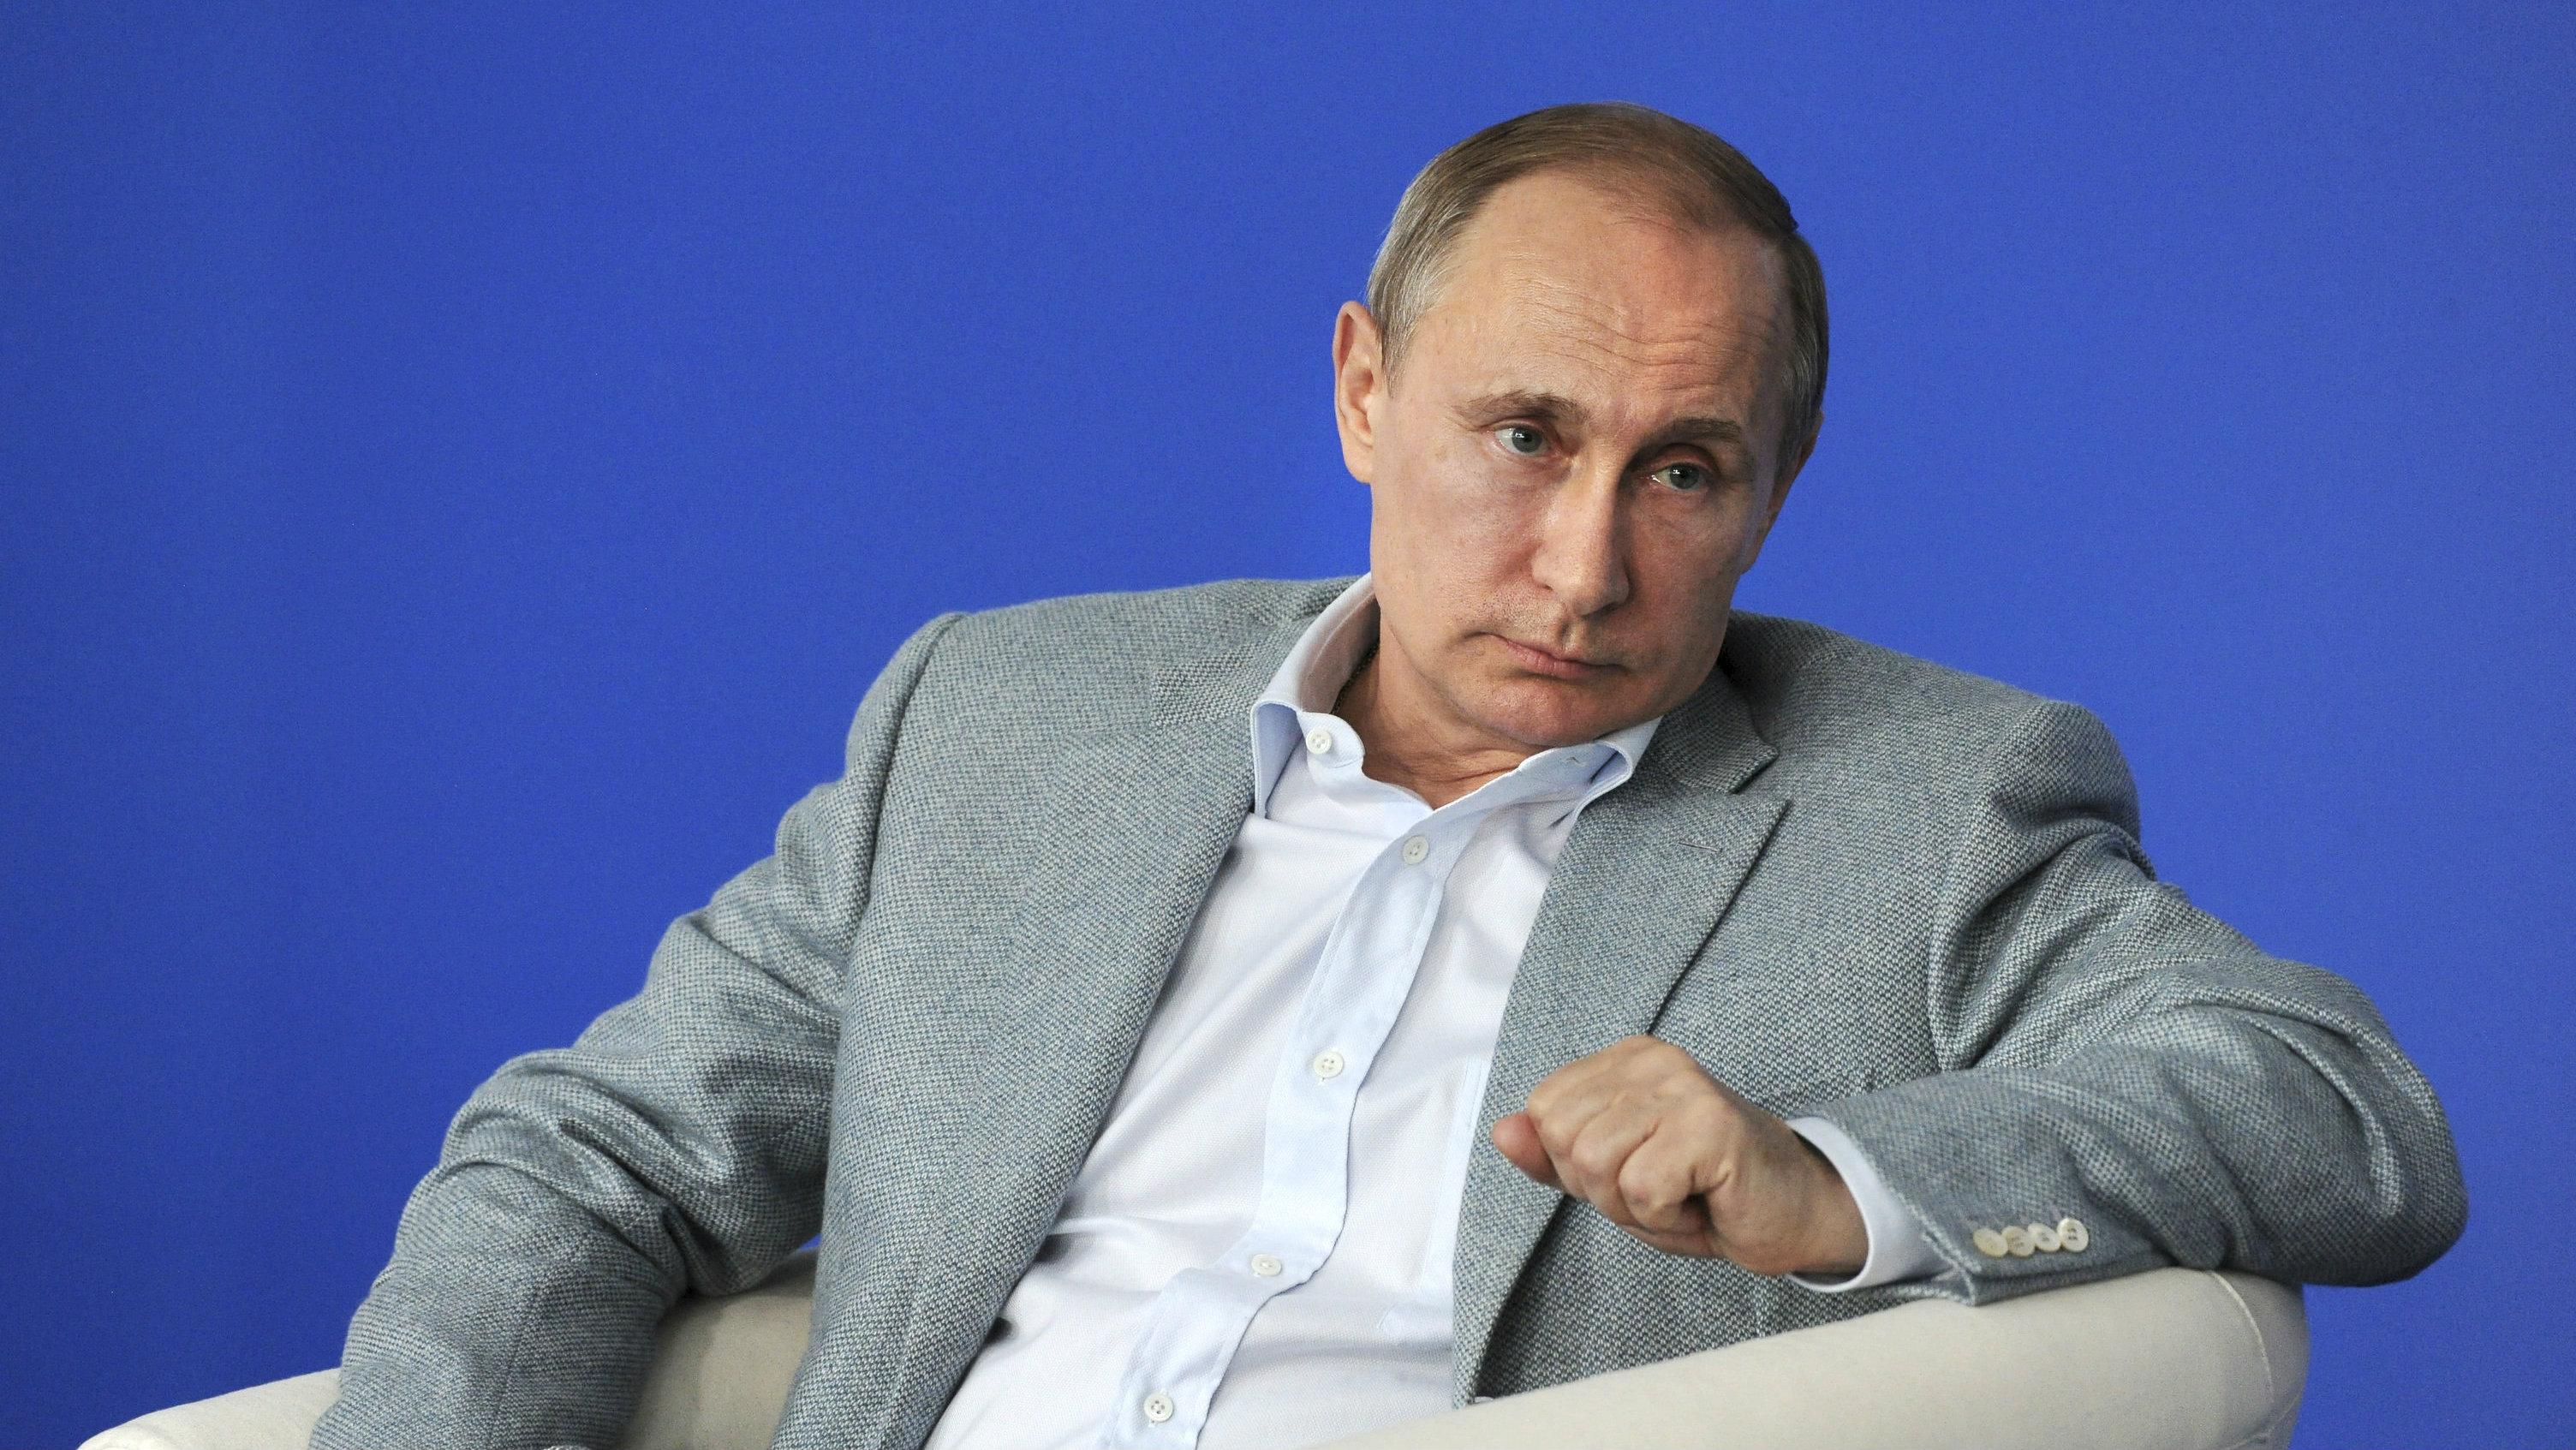 Russian President Vladimir Putin attends an educational youth forum in Vladimir region, Russia July 14, 2015.